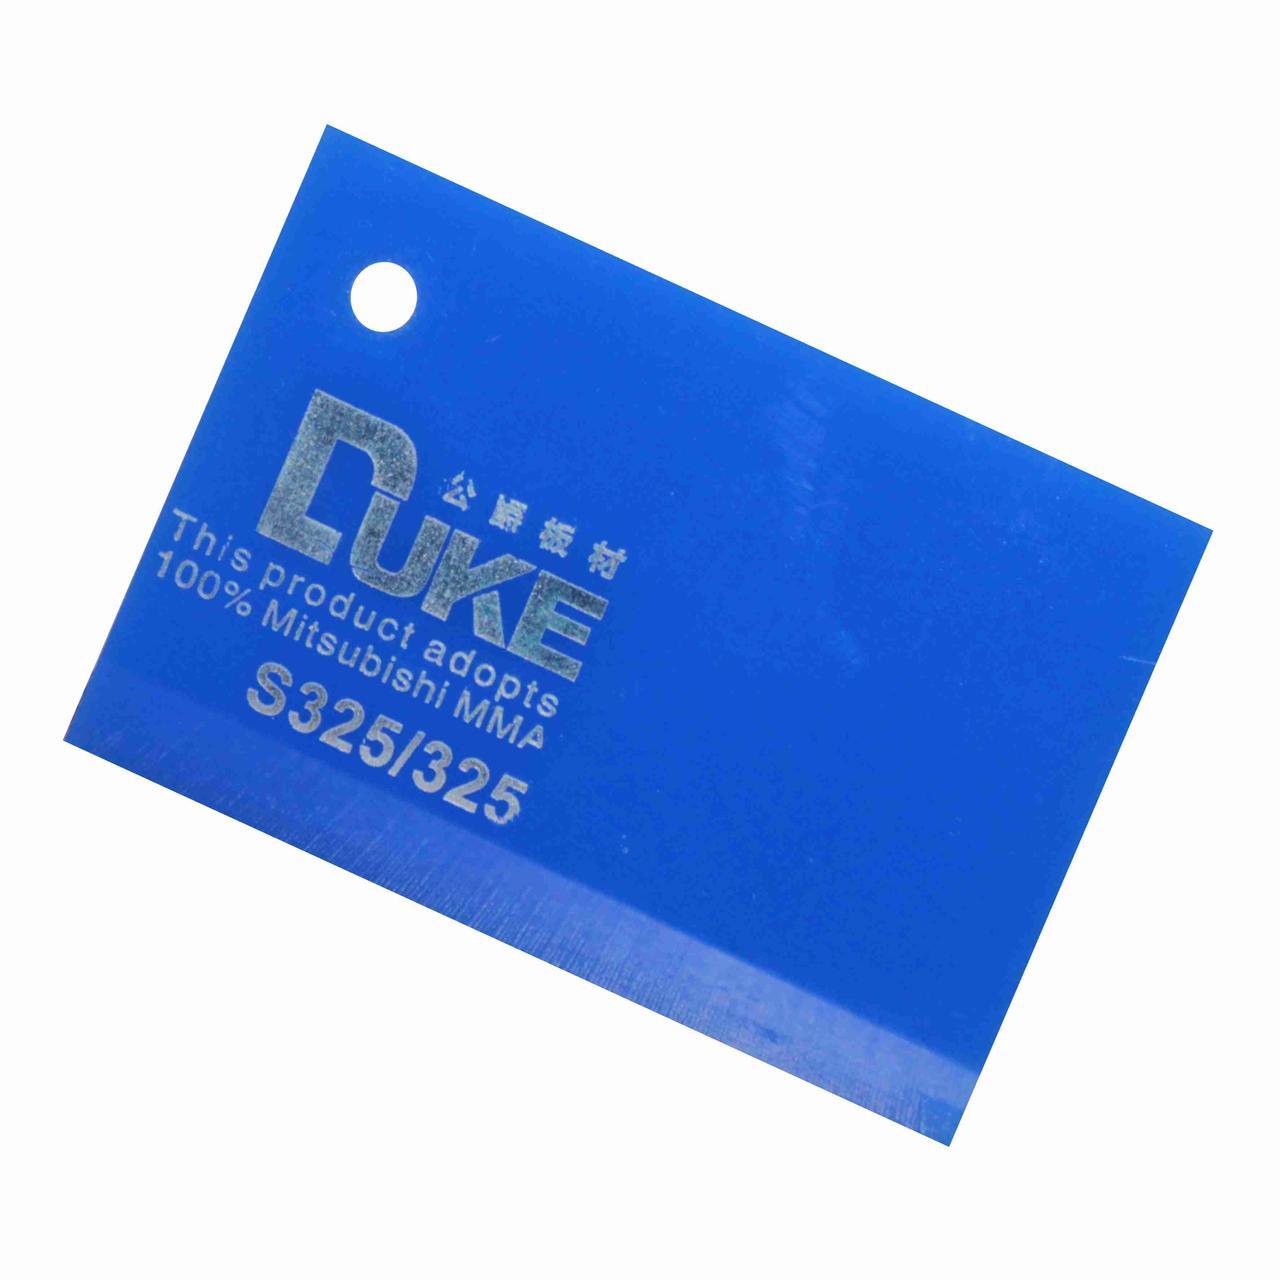 Акрил синий №325 (3мм) 1,22мХ2,44м